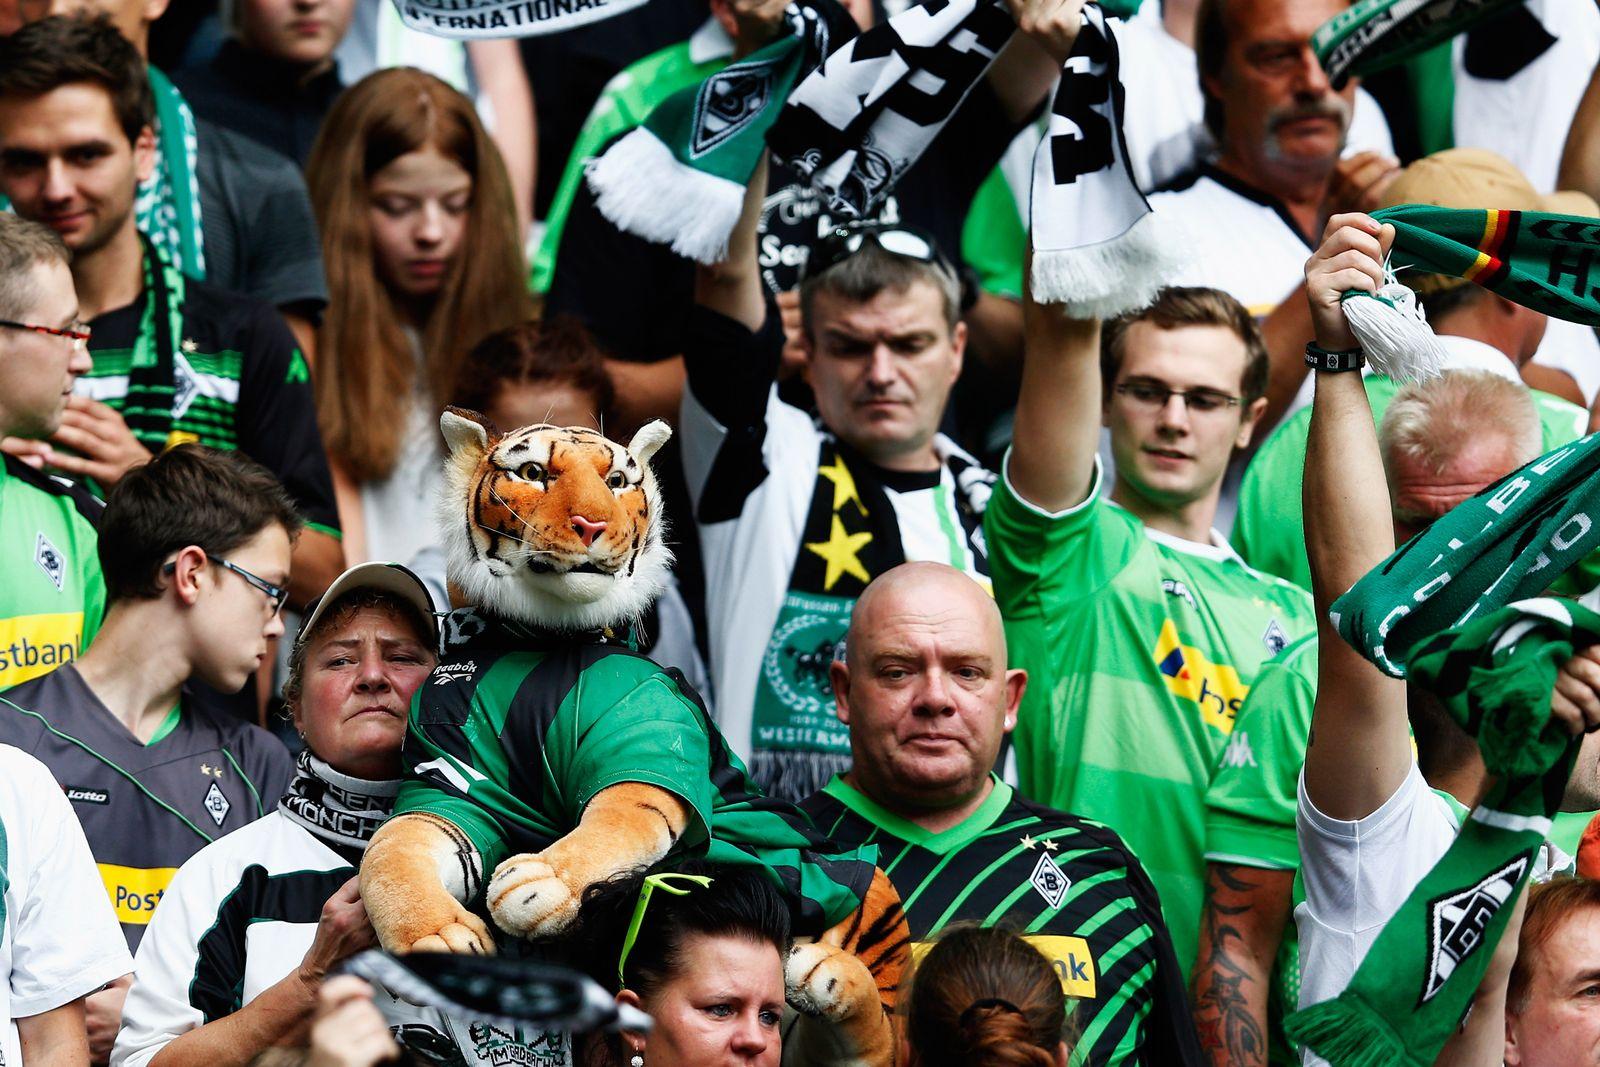 Fans/ 2015/ Mönchengladbach